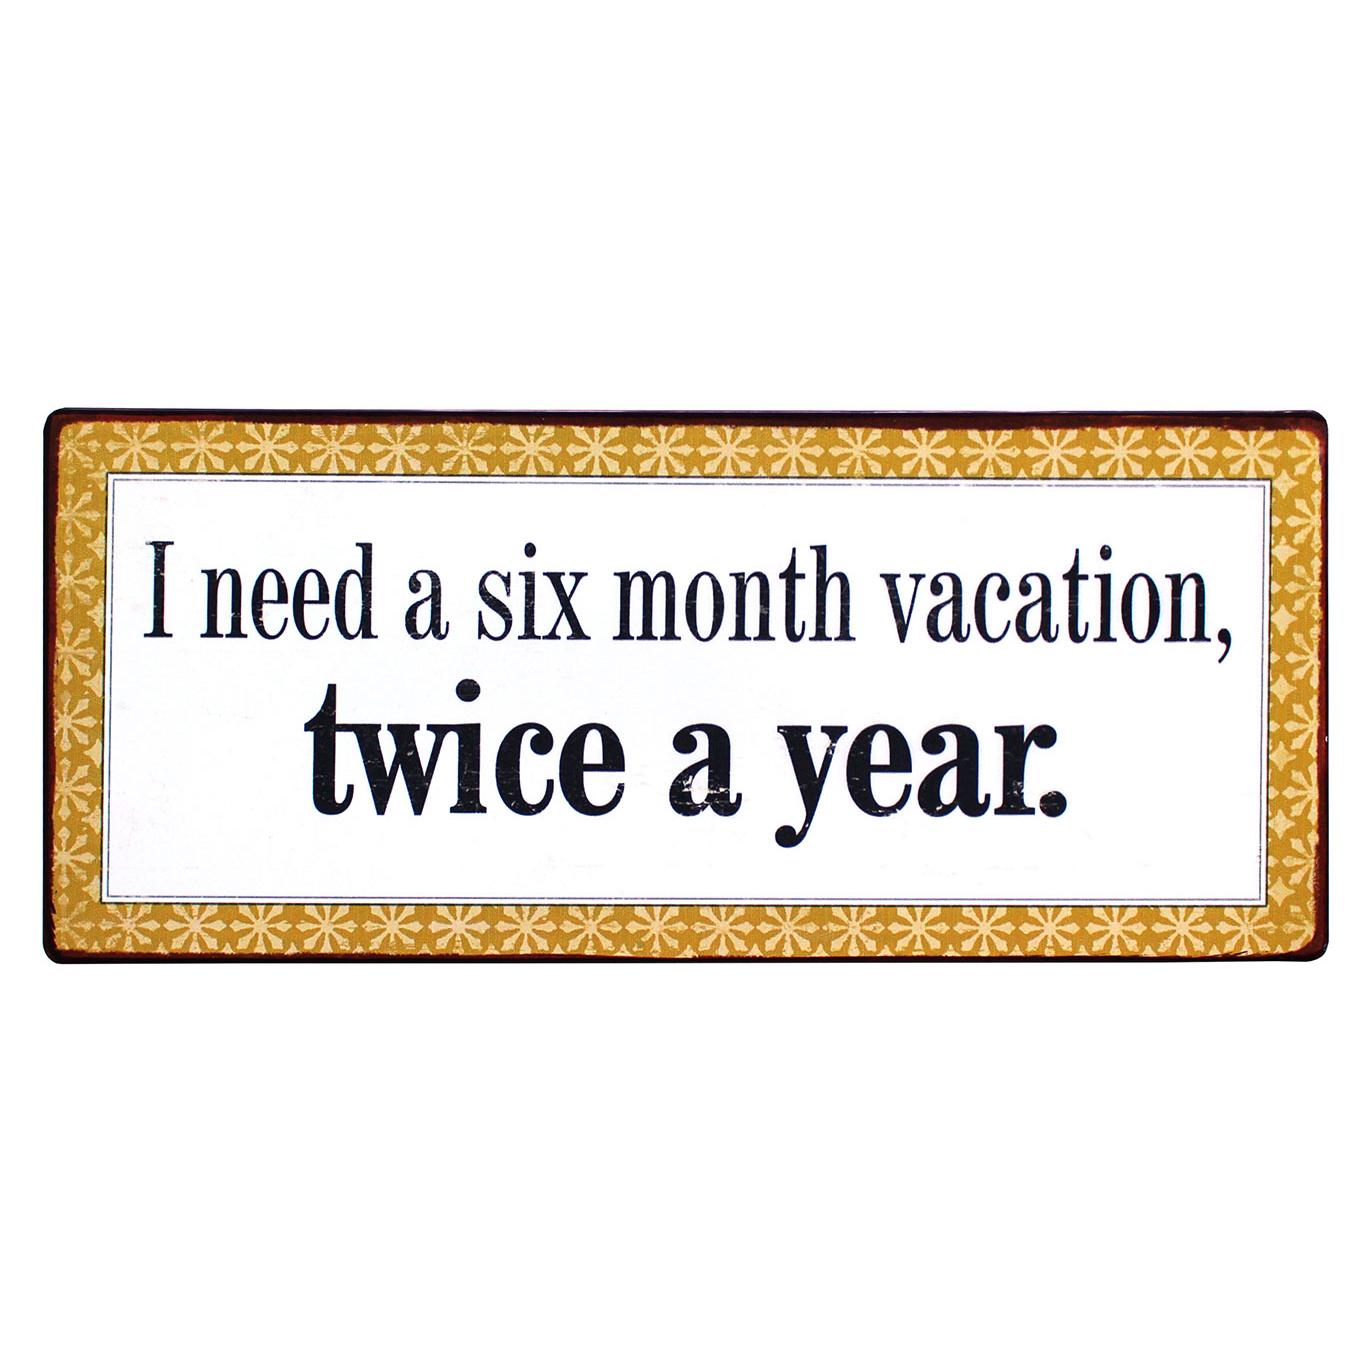 em4268-I-need-a-six-mouth-vacation-twice-a-year-rustiek-tekst-bord-cadeau-kado-online-metaal-deco-decoratie vv